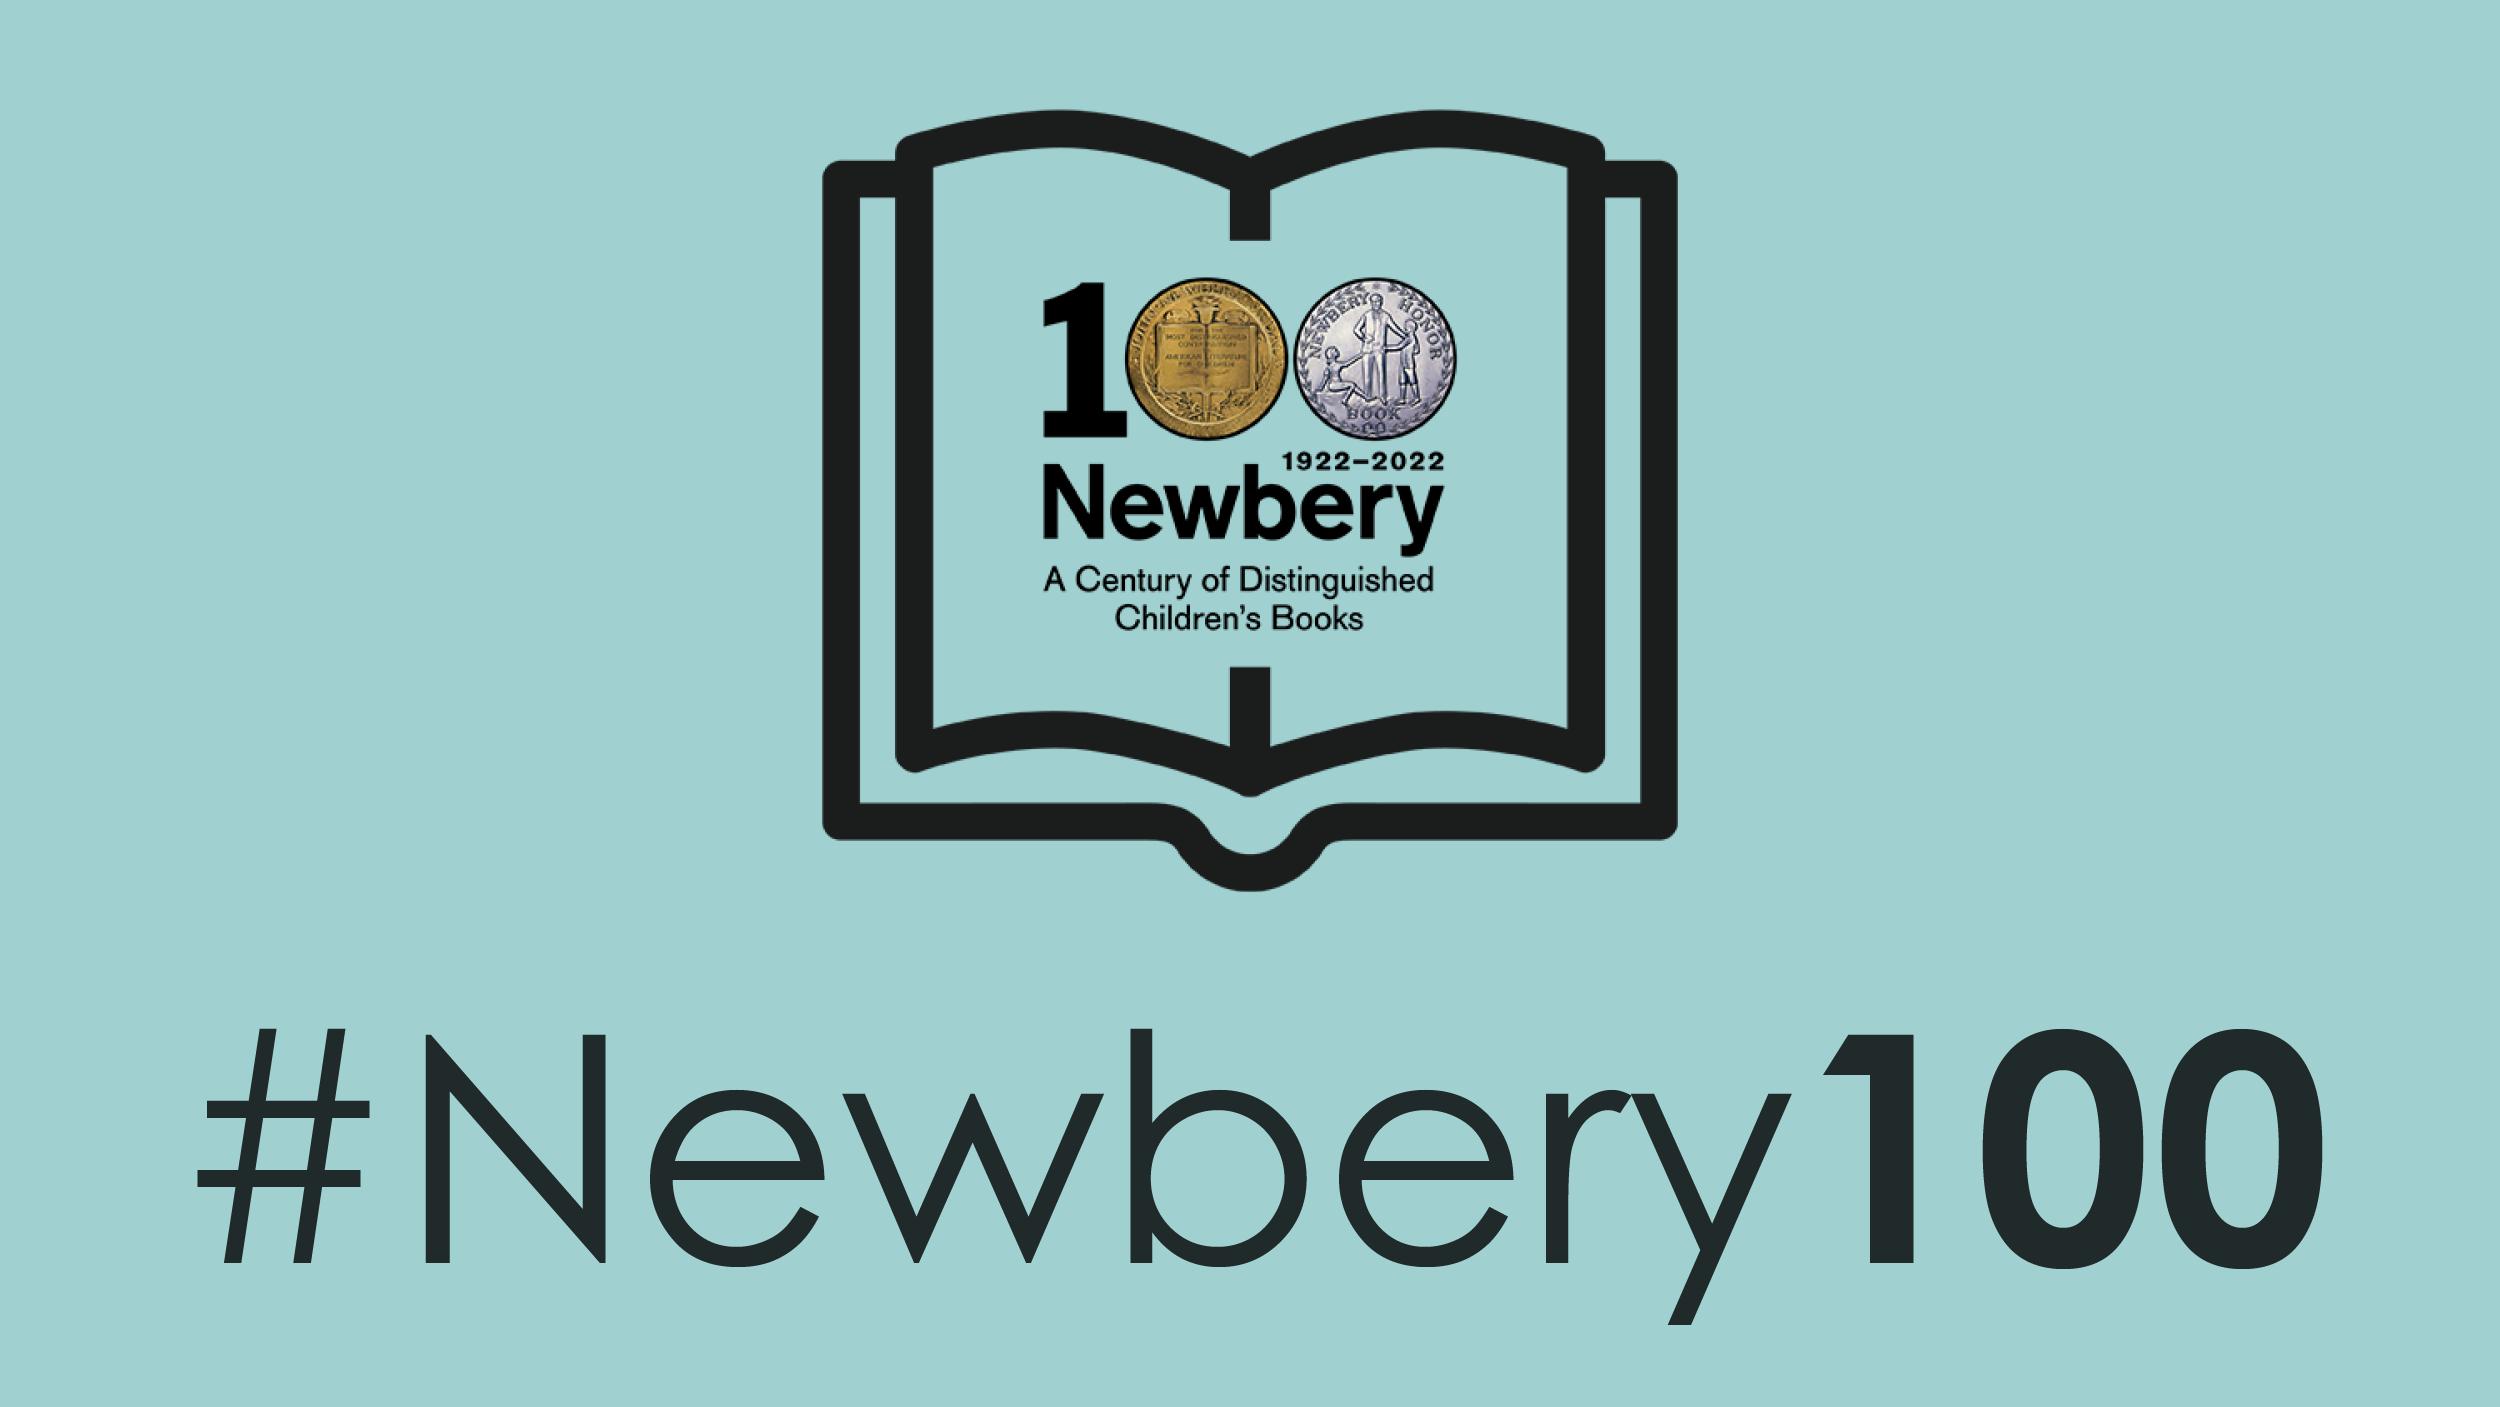 Newbery100 Logo